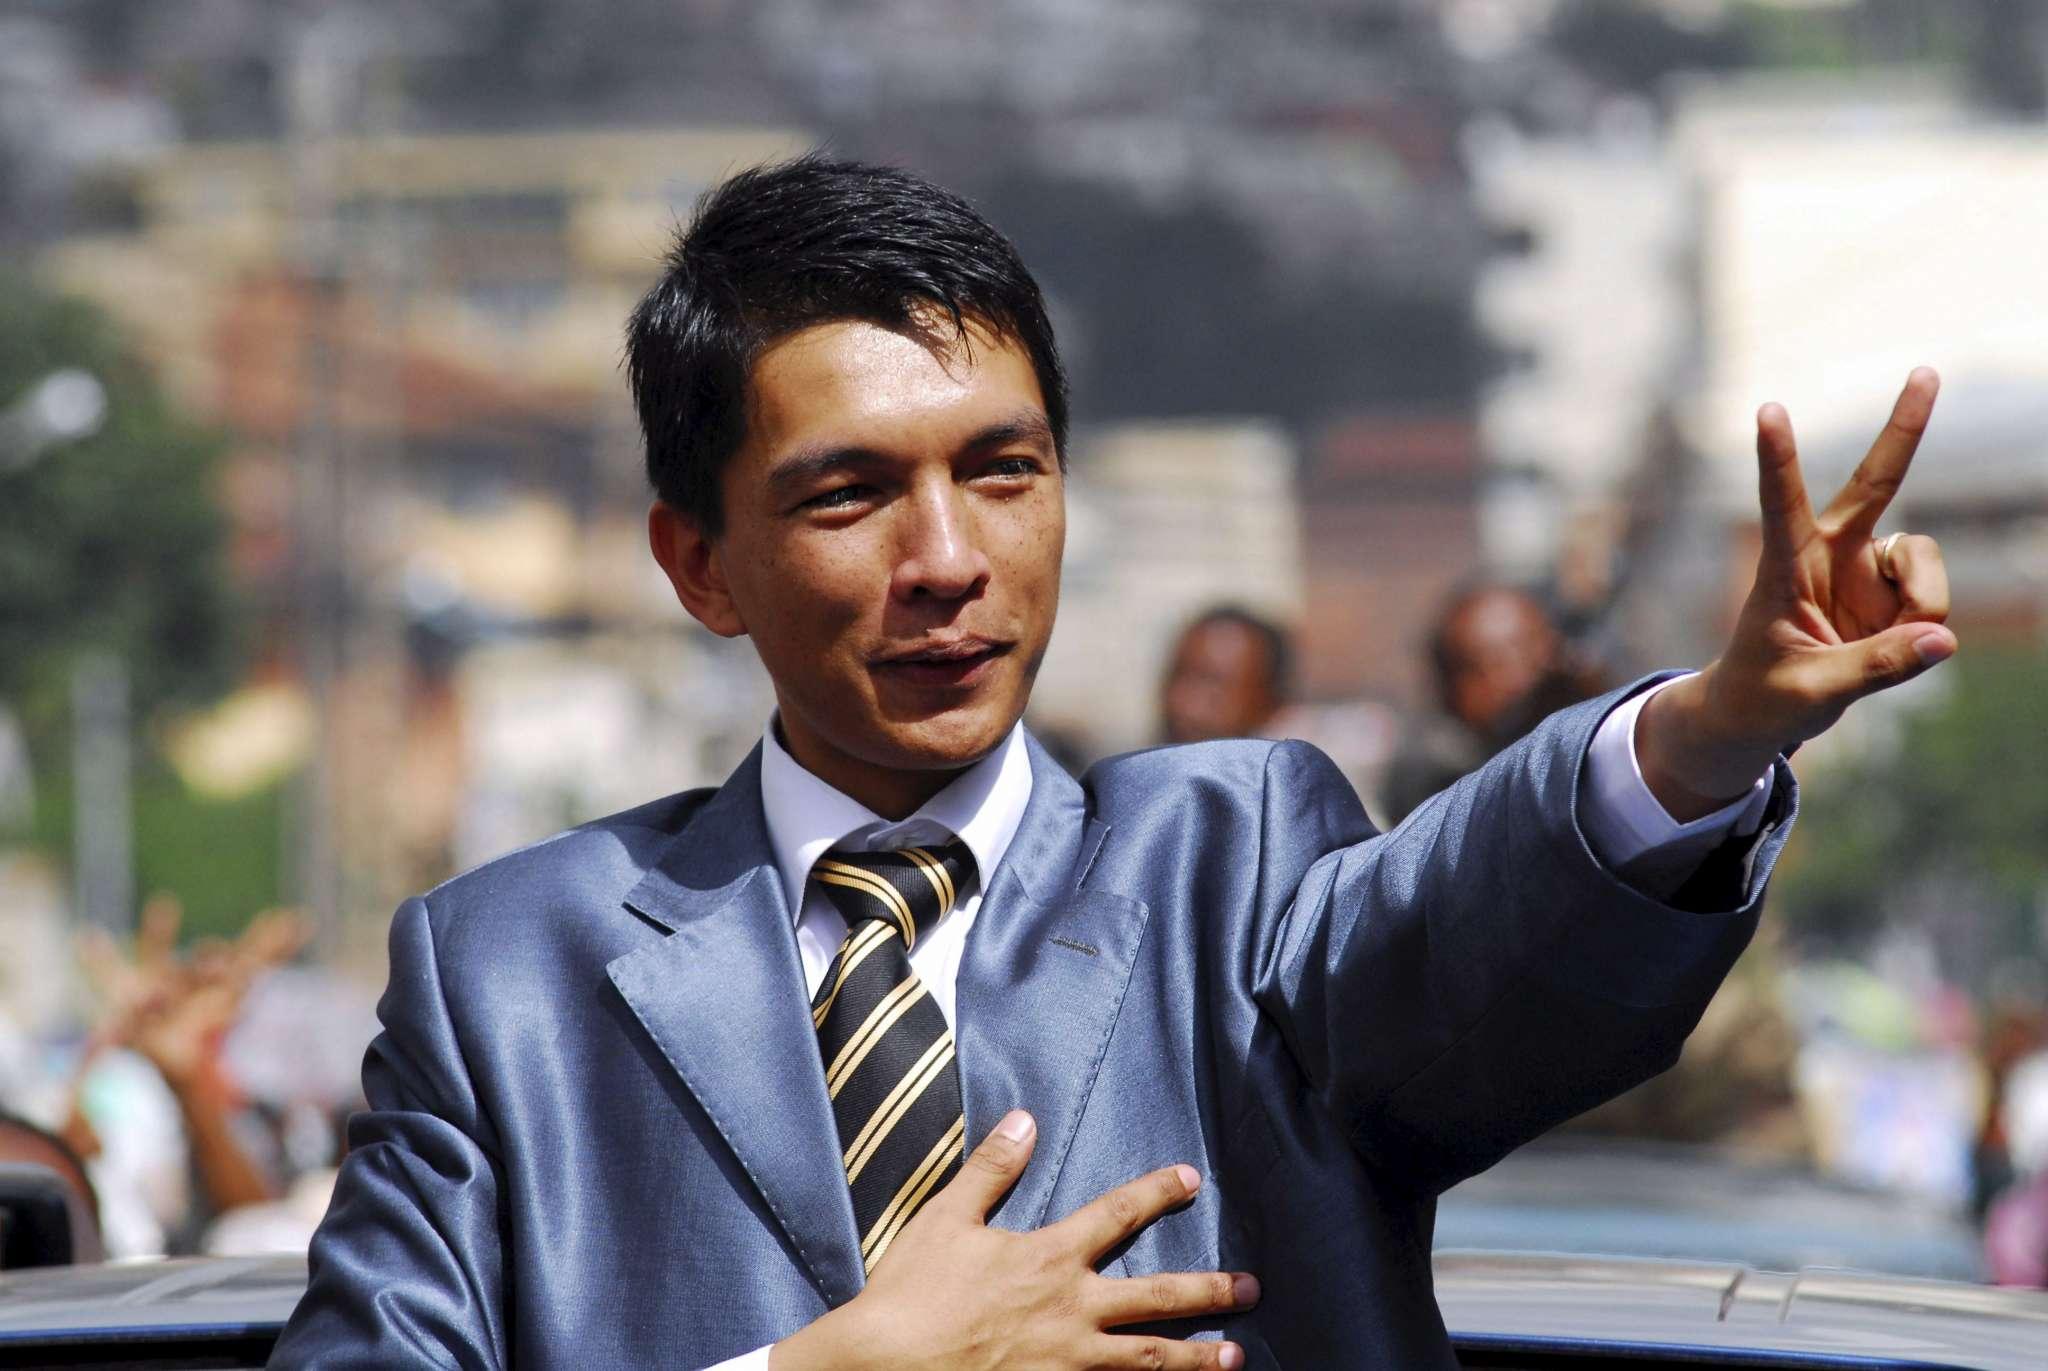 Andry Rajoelina of Madagascar